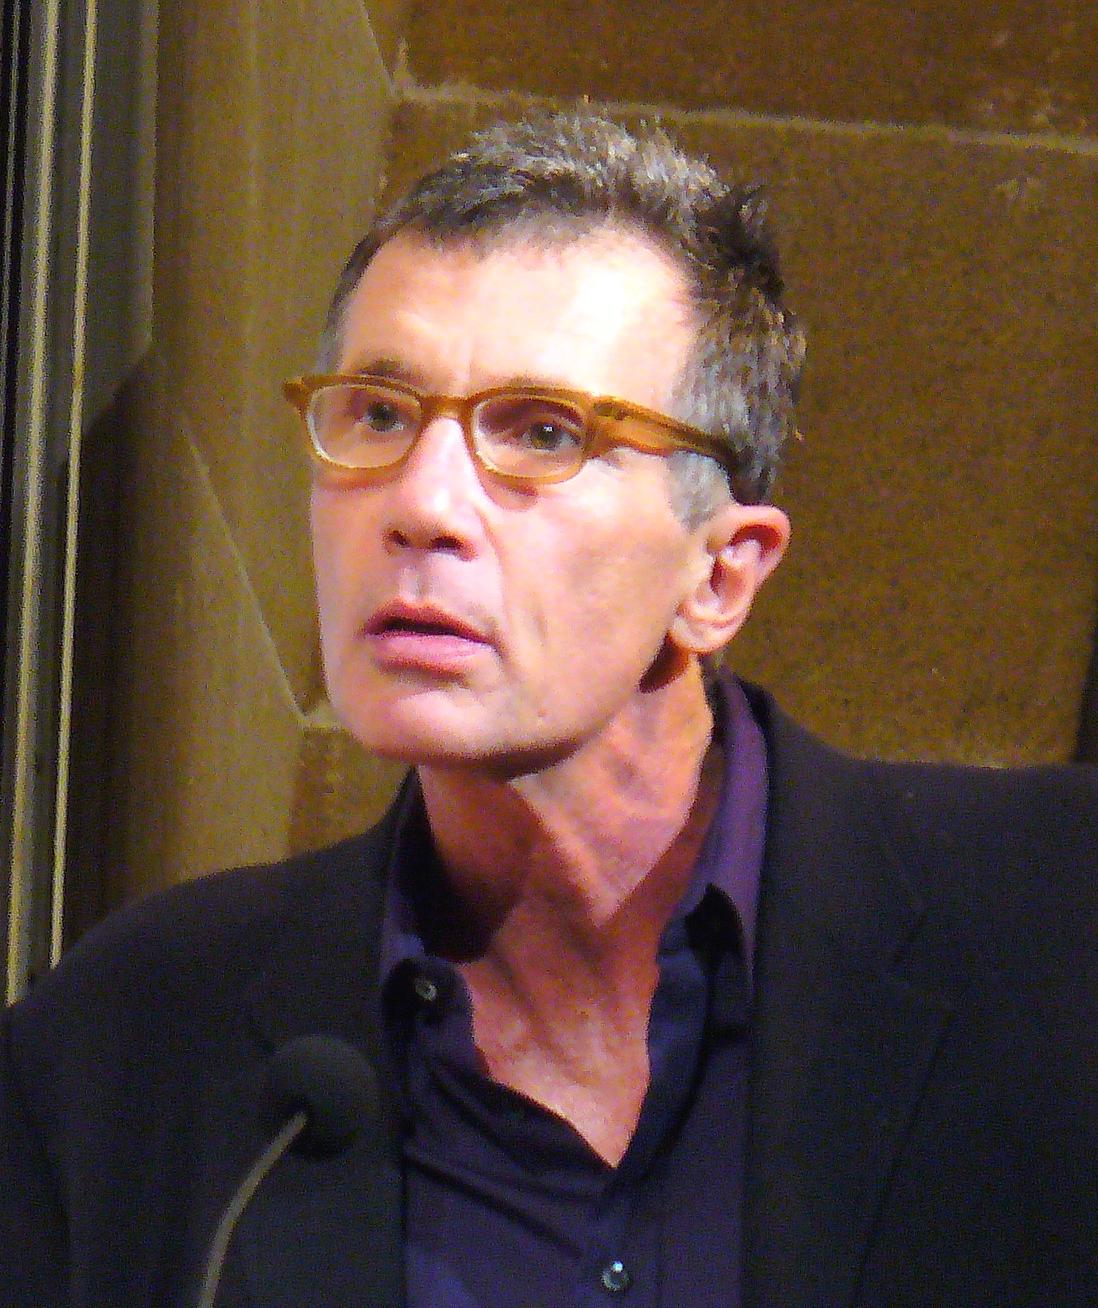 Michael Cunningham Net Worth